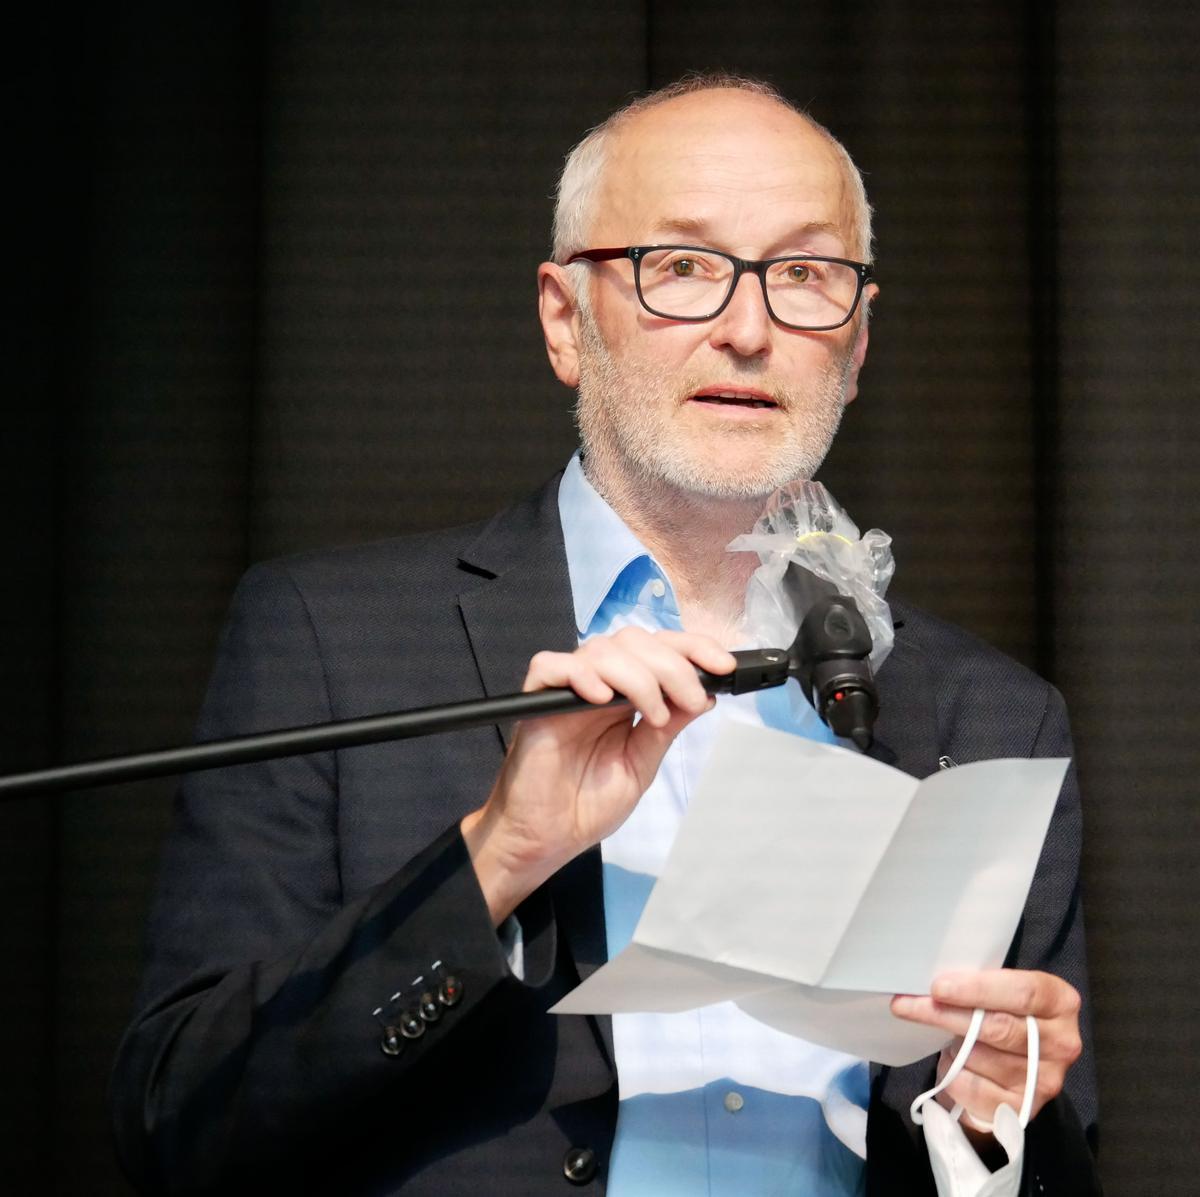 Sportlehrer Richard Huerkamp trug das Grußwort des Schulpflegschaftsvorsitzenden Robert Uphues vor. Fotos: Schomakers